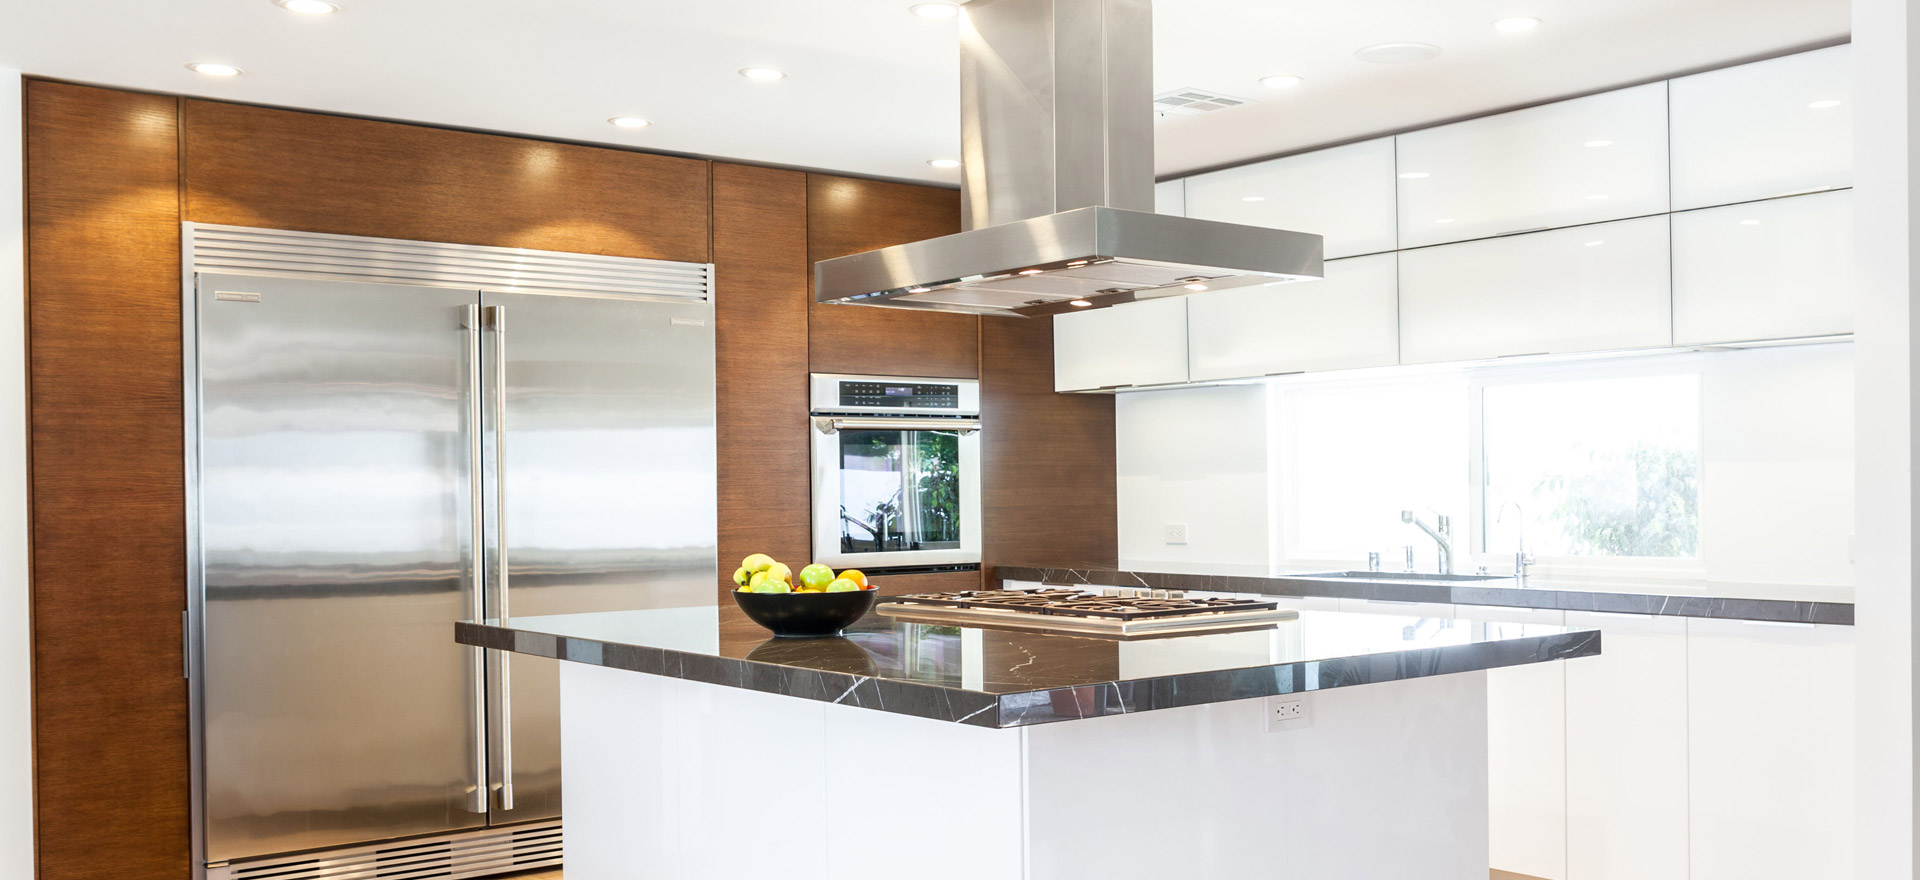 Luxus Construction | General Contractor Beverly Hills, CA